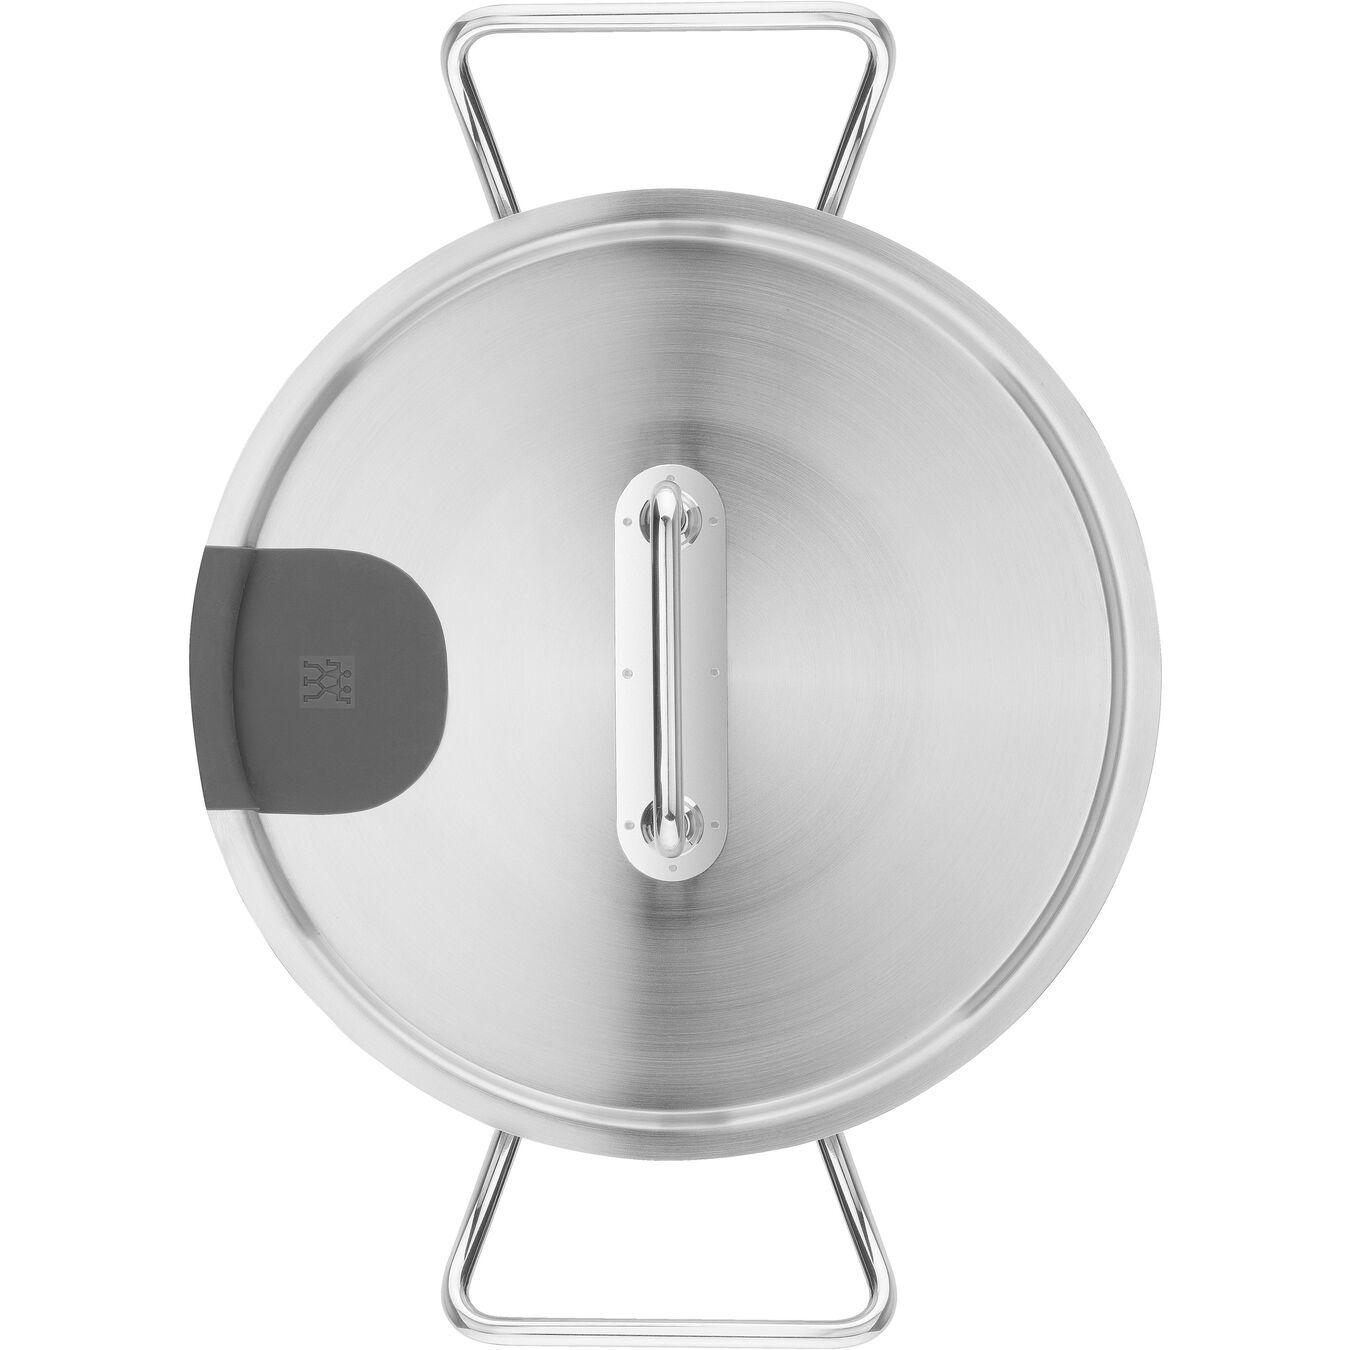 coperchio per cottura a bassa temperatura 24 cm, 18/10 acciaio inossidabile,,large 5